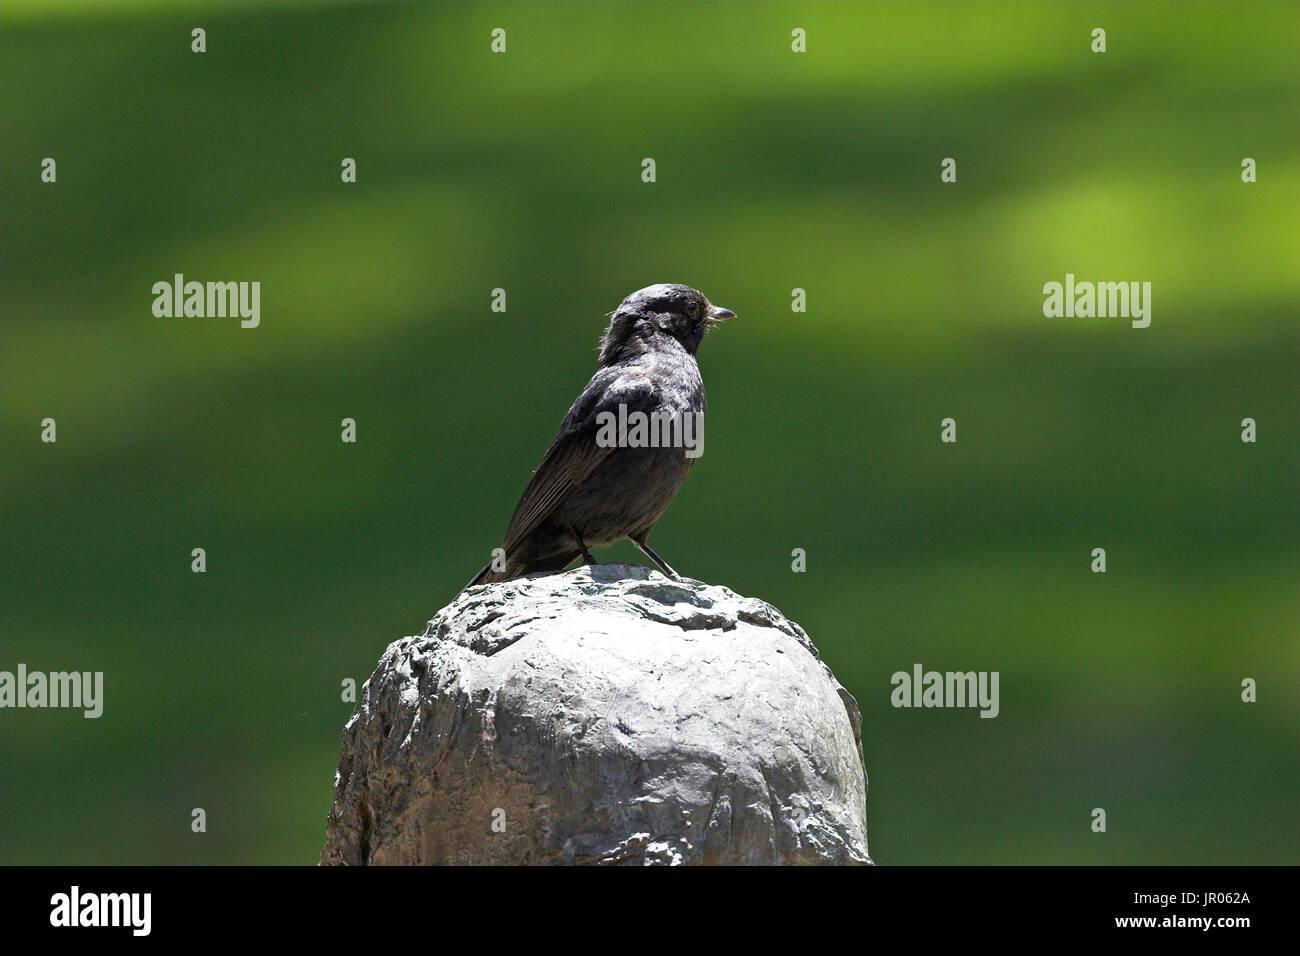 Southern black flycatcher Melaenornis pammelaina Durban Botanical Garden South Africa - Stock Image